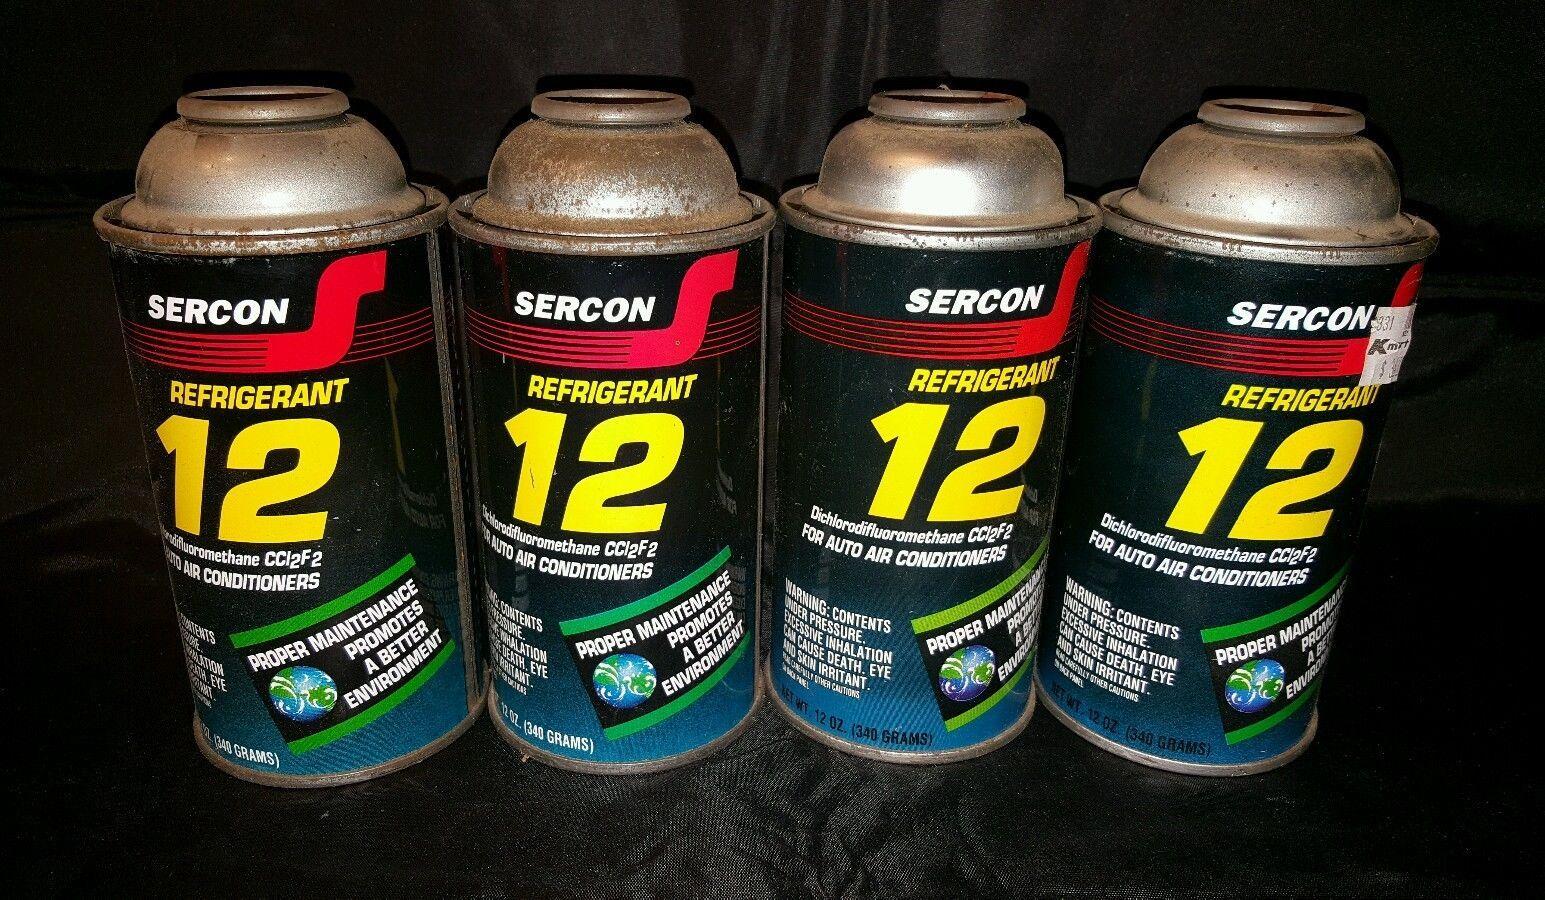 R12 Freon Automotive Ac Refrigerant Four 12 Oz Cans Sercon C